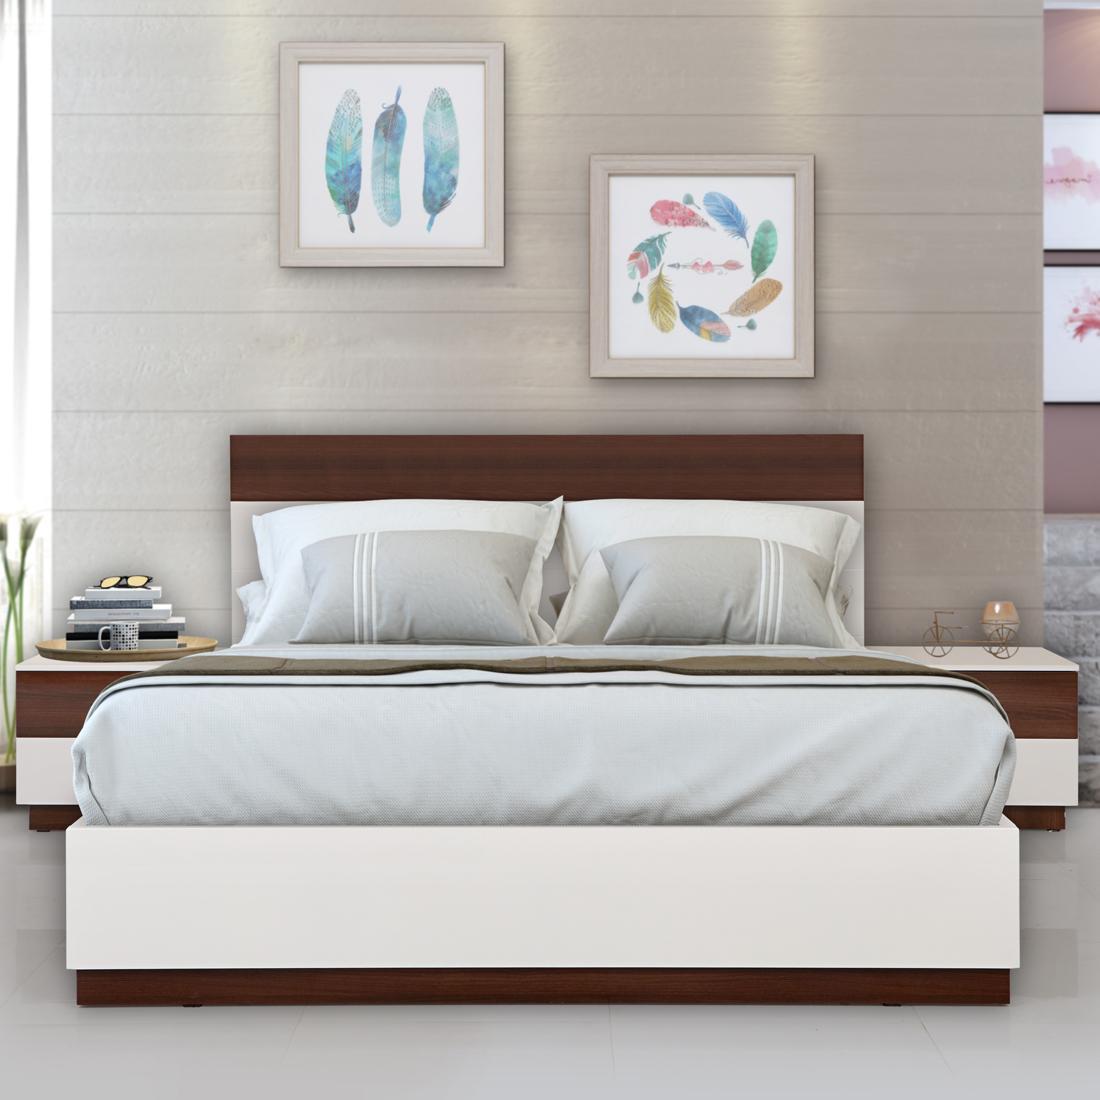 Buy Element Engineerwood Queen Bed With Fullhydraulic Storage White Walnut Online Evok